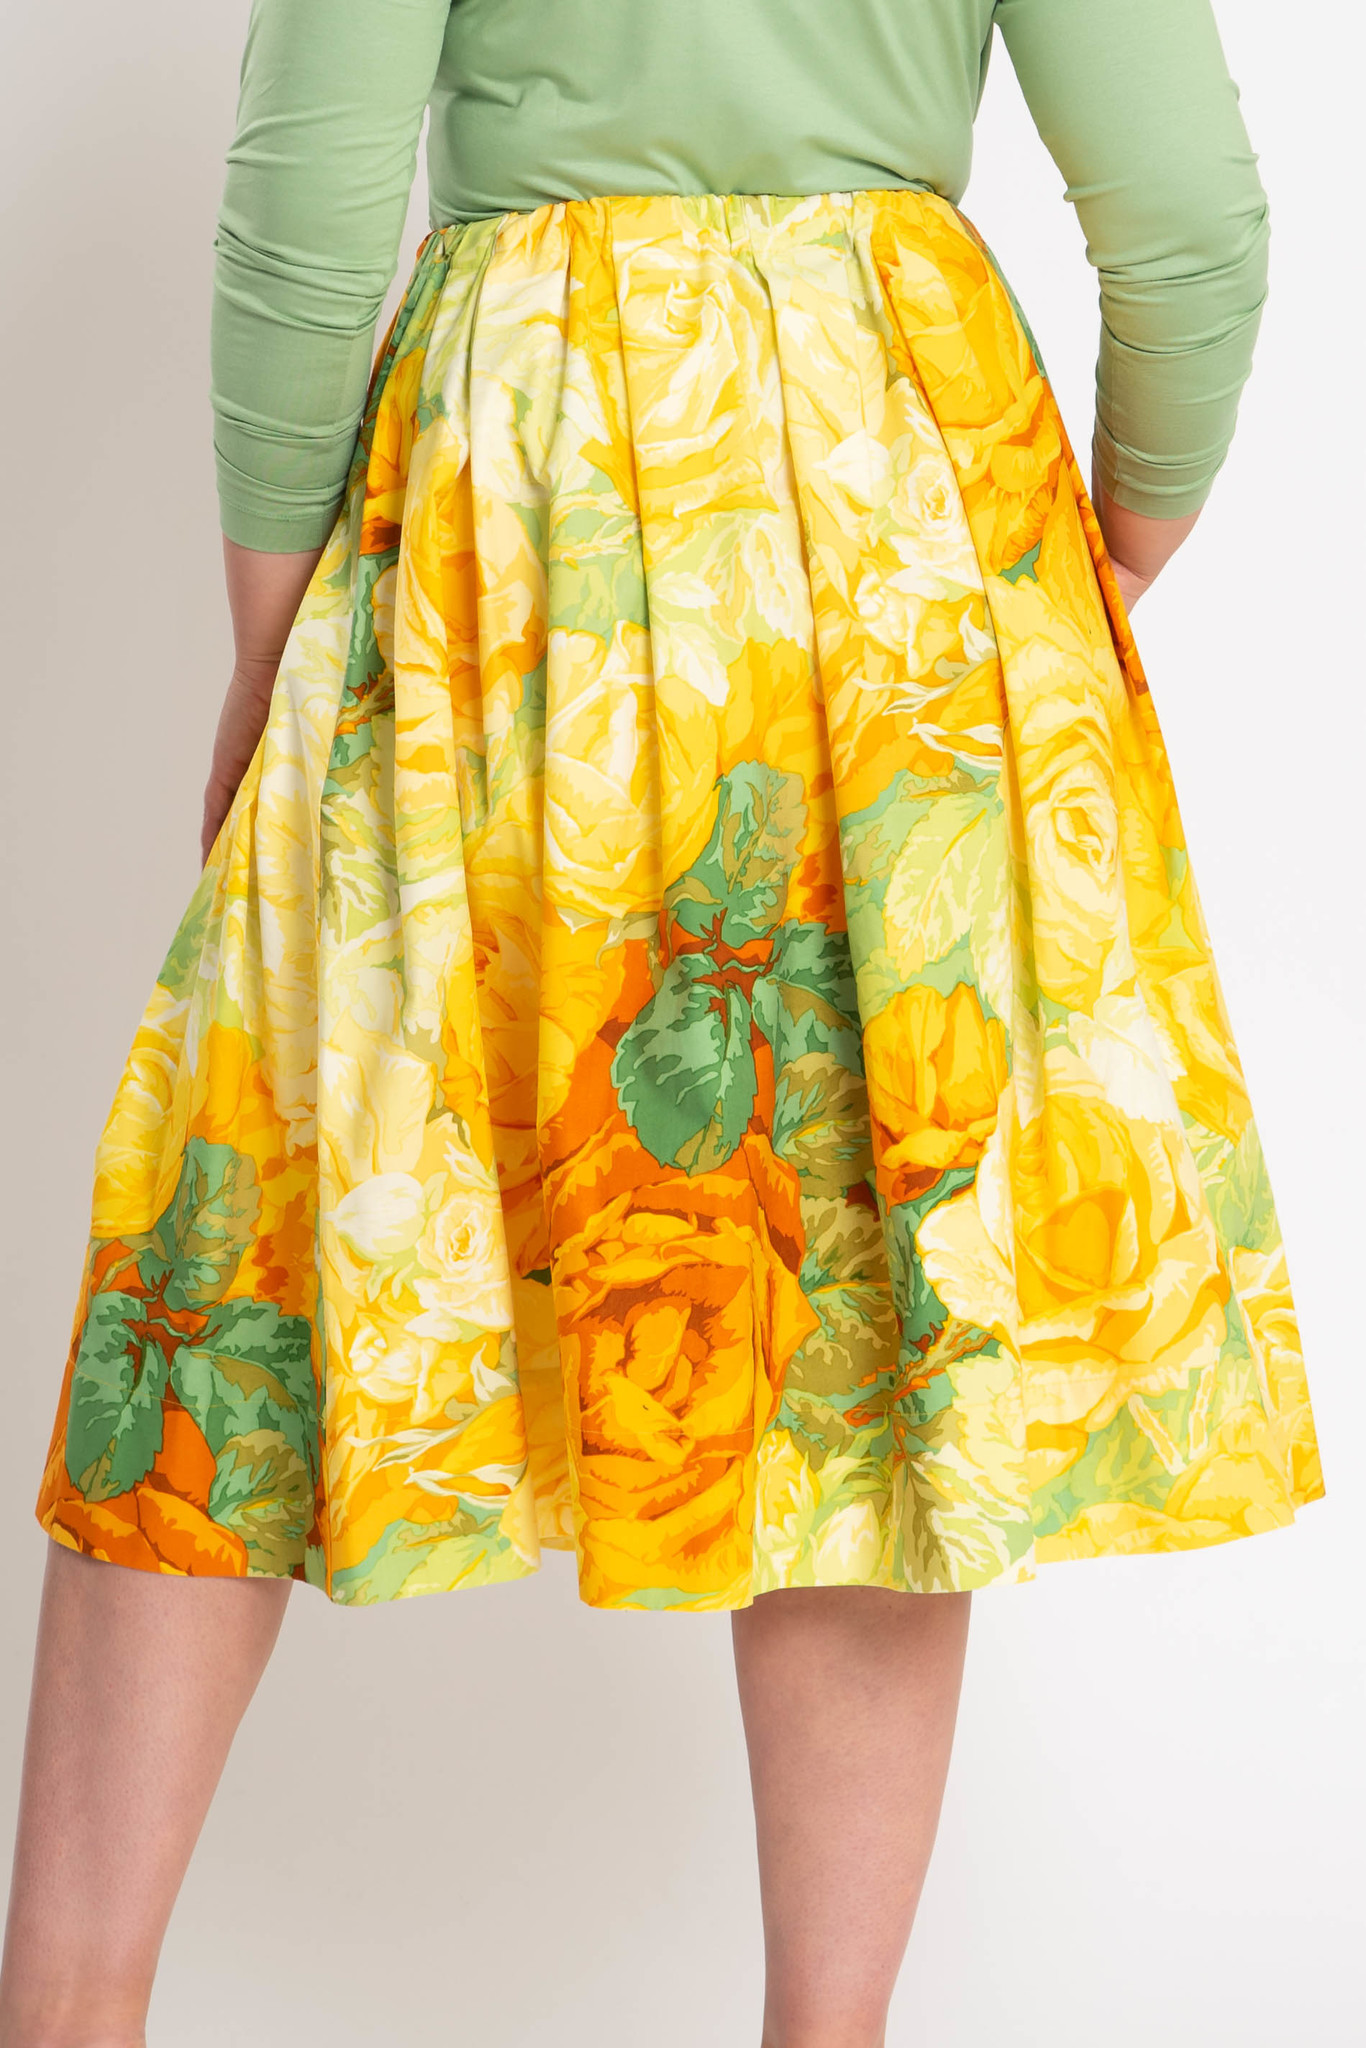 TULIP Skirt in Cotton-3